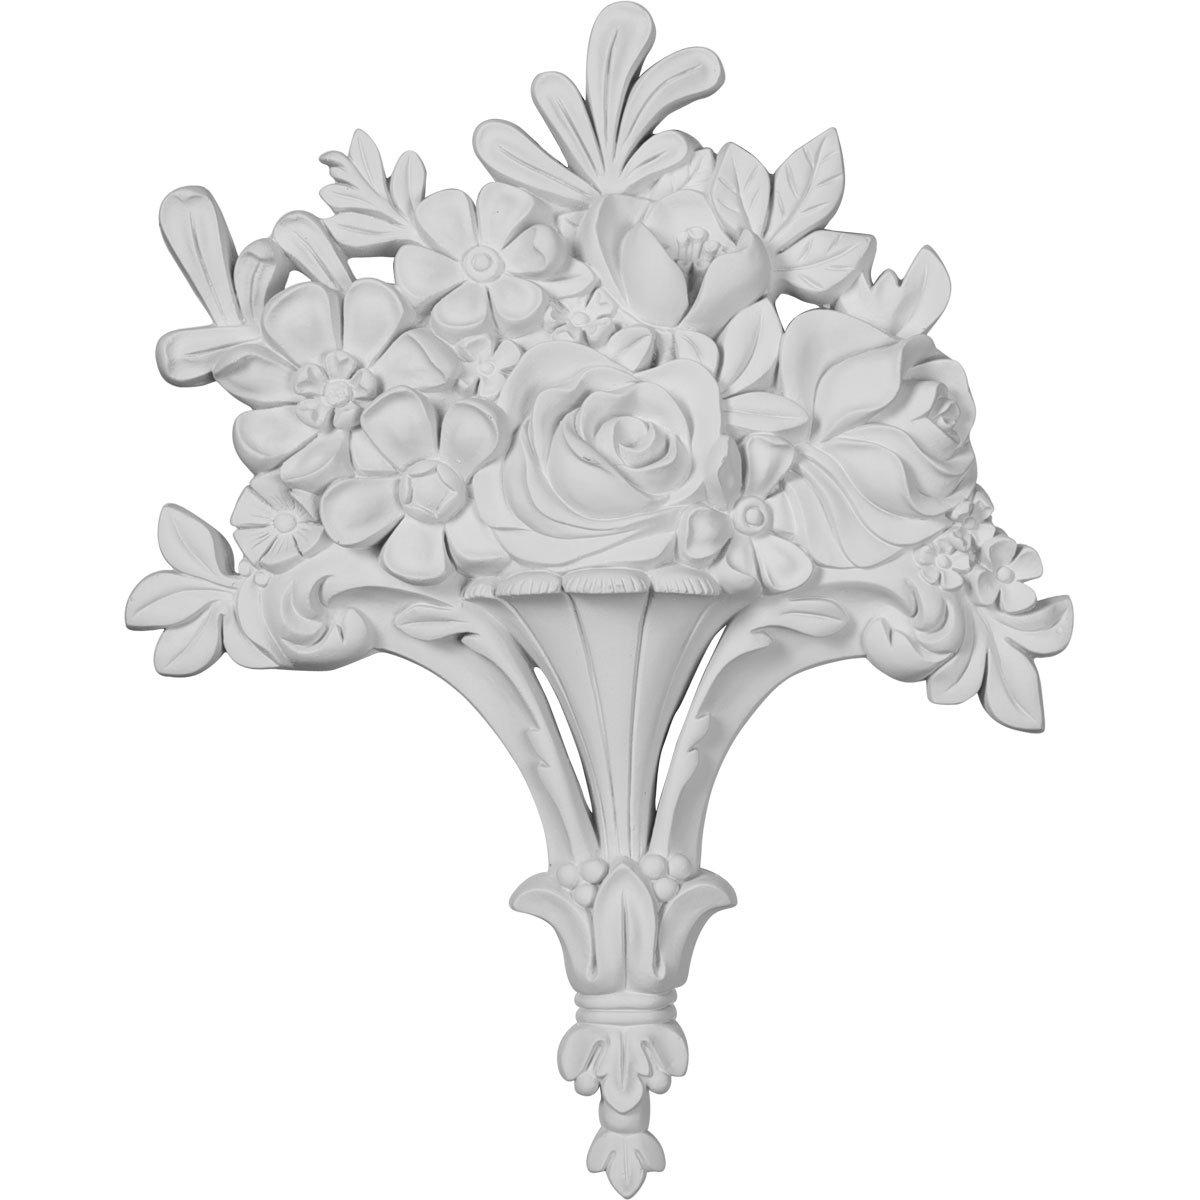 Ekena Millwork ONL10X13X01FB 10 5//8-Inch W X 13 1//4-Inch H X 1 3//4-Inch P Flower Basket Center Onlay